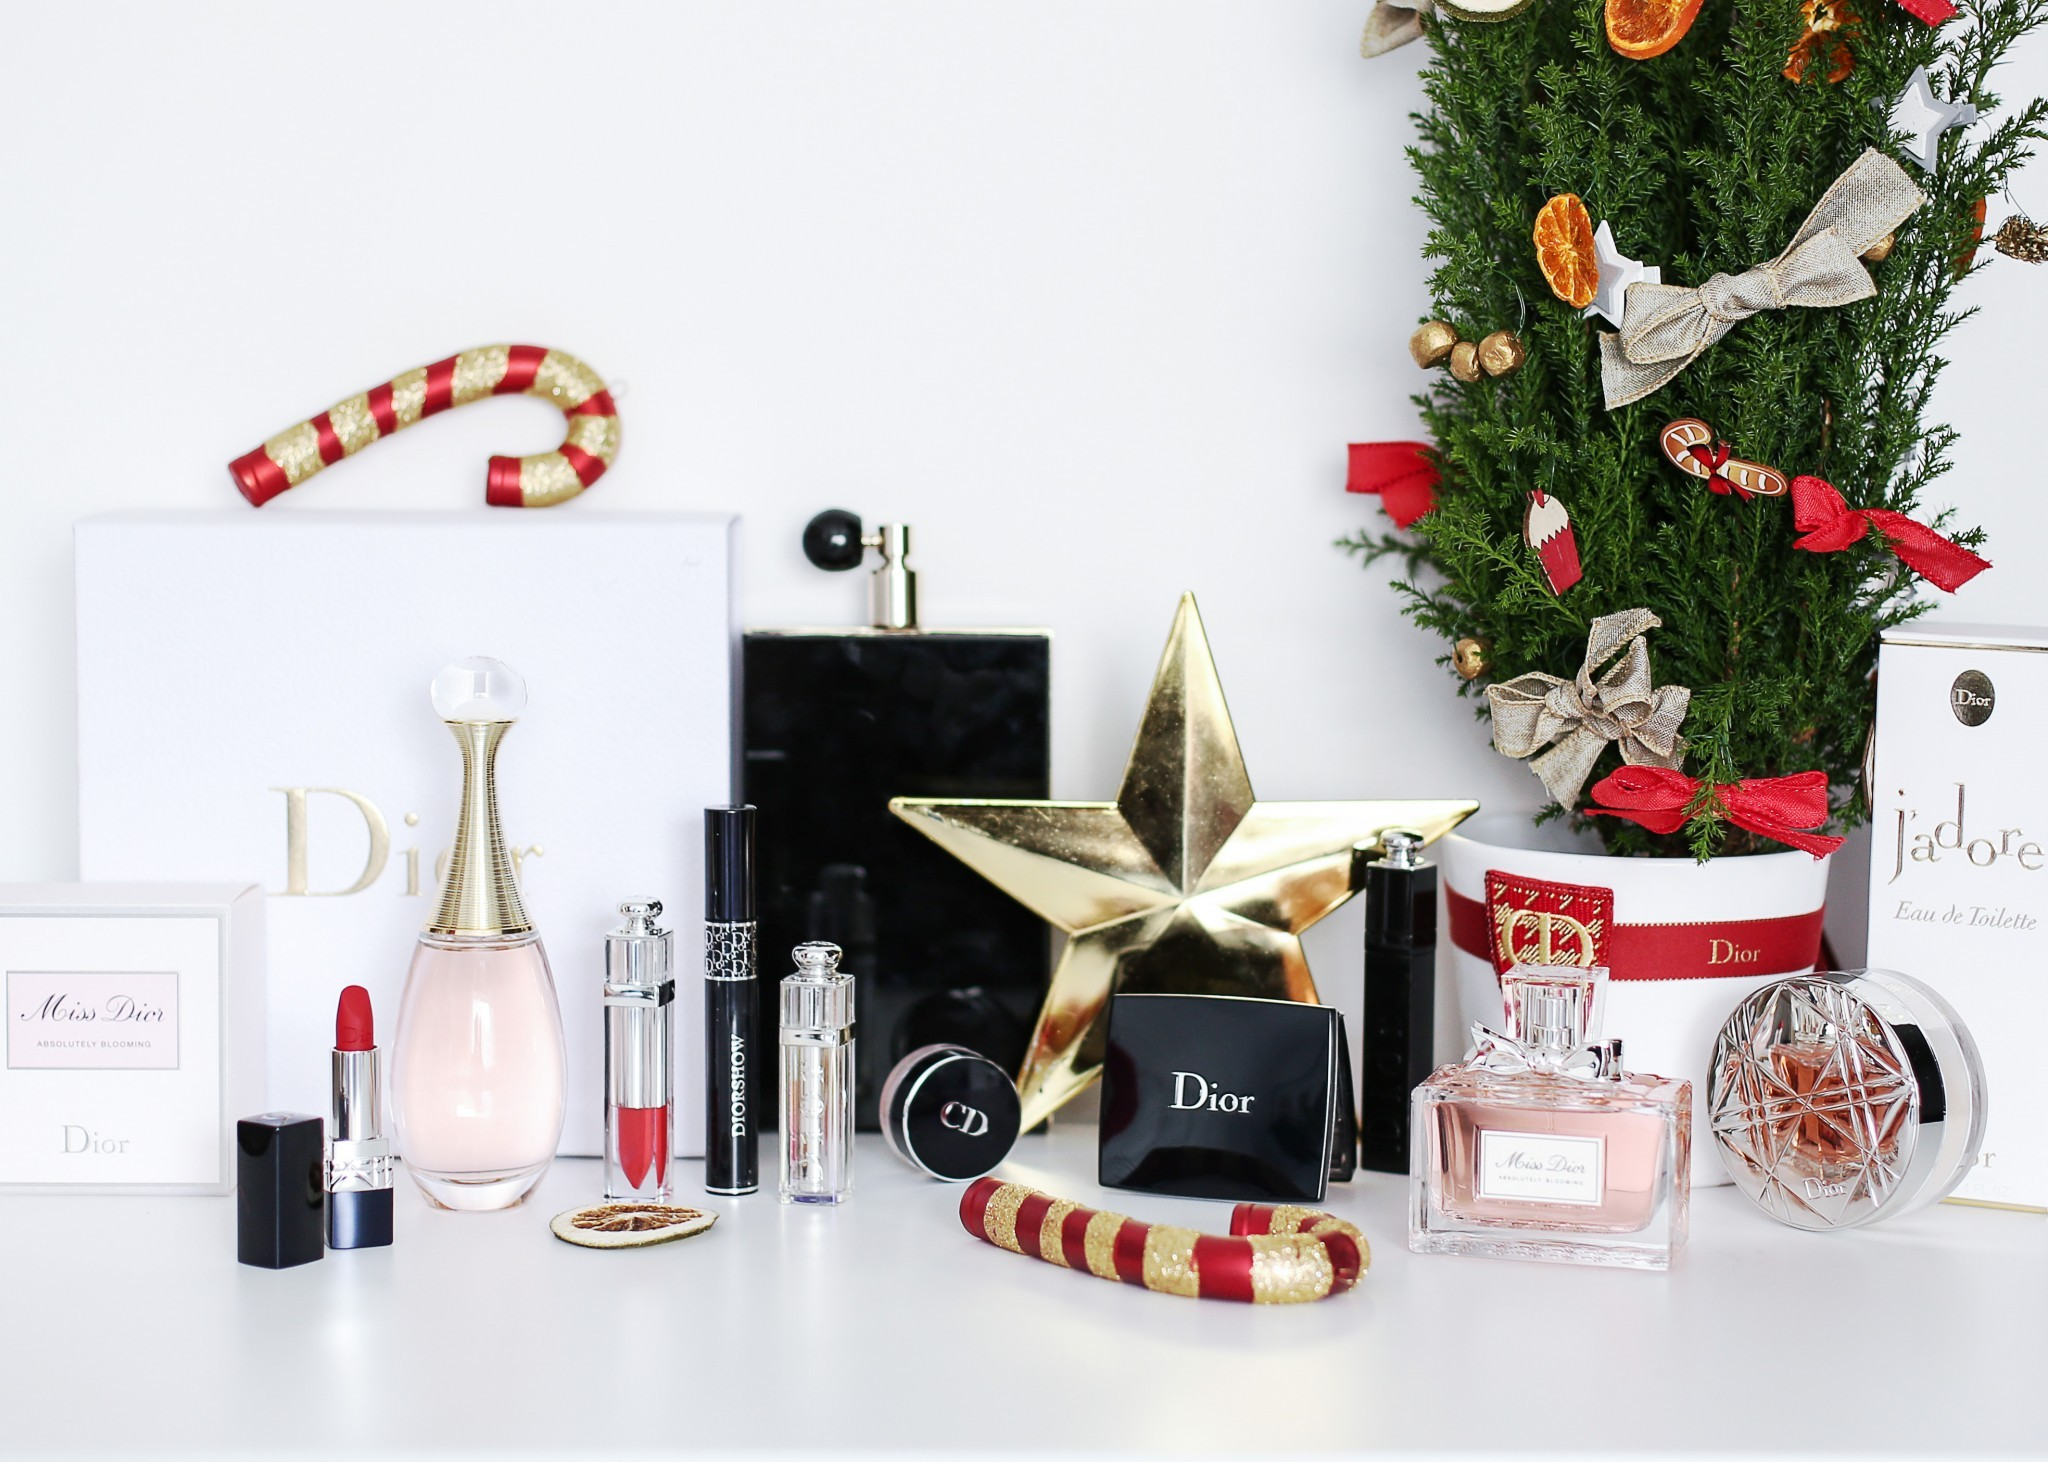 1dior_cadou_craciun_christmas_gifts_fabulous_muses_ideicadpouri